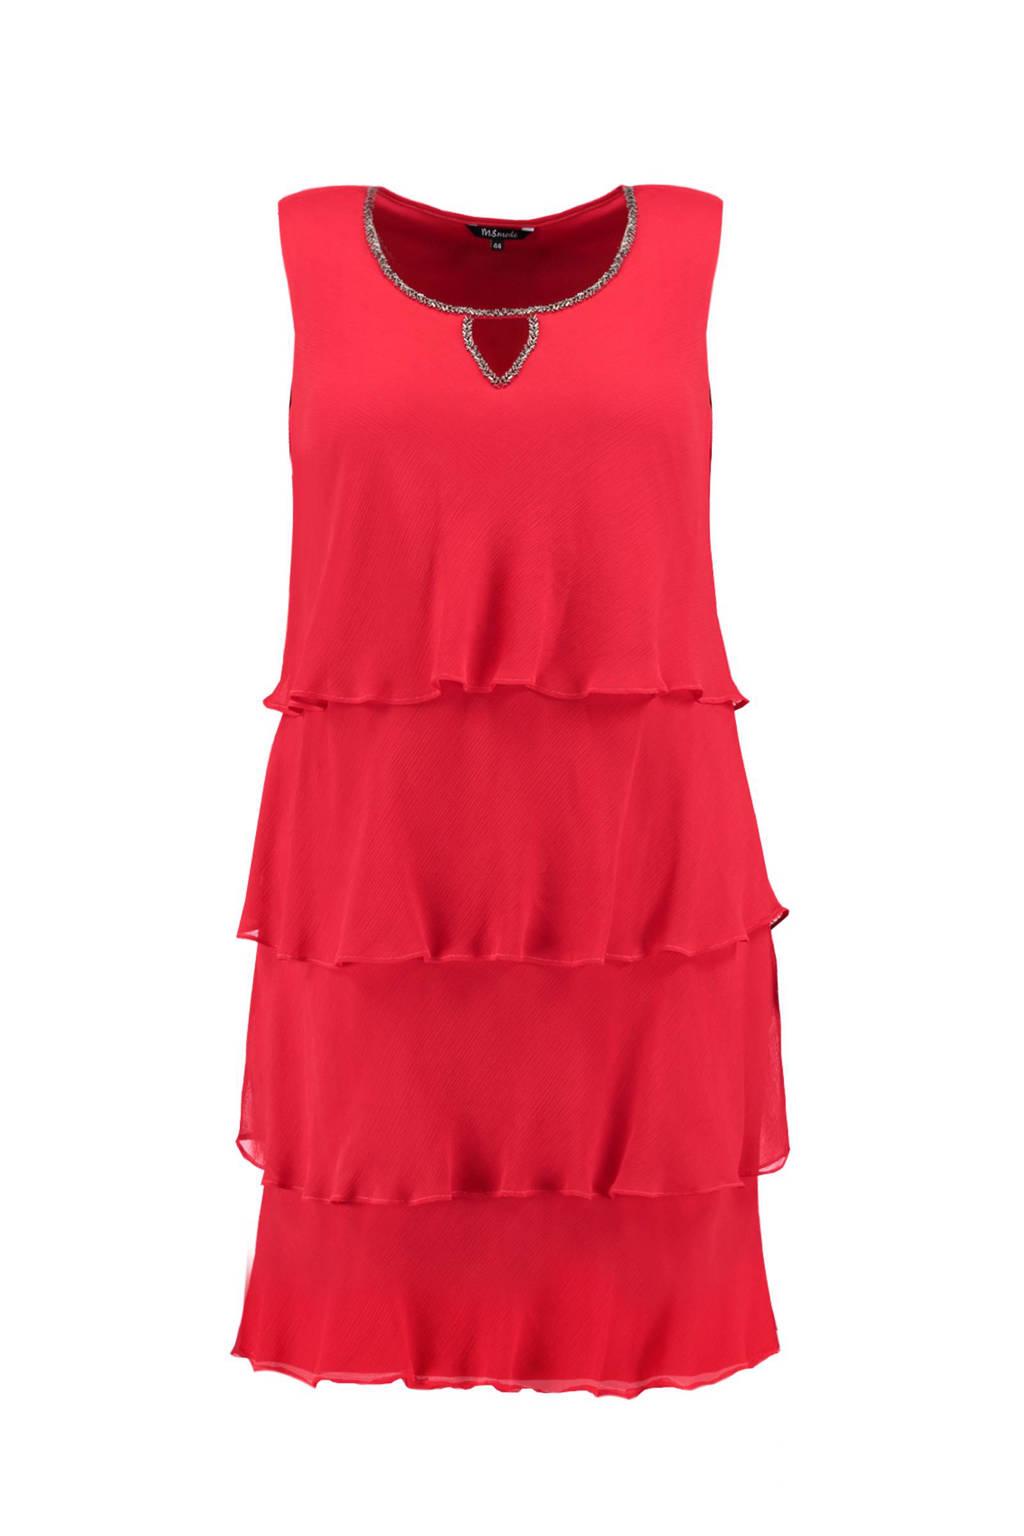 MS Mode jurk met volant, Rood